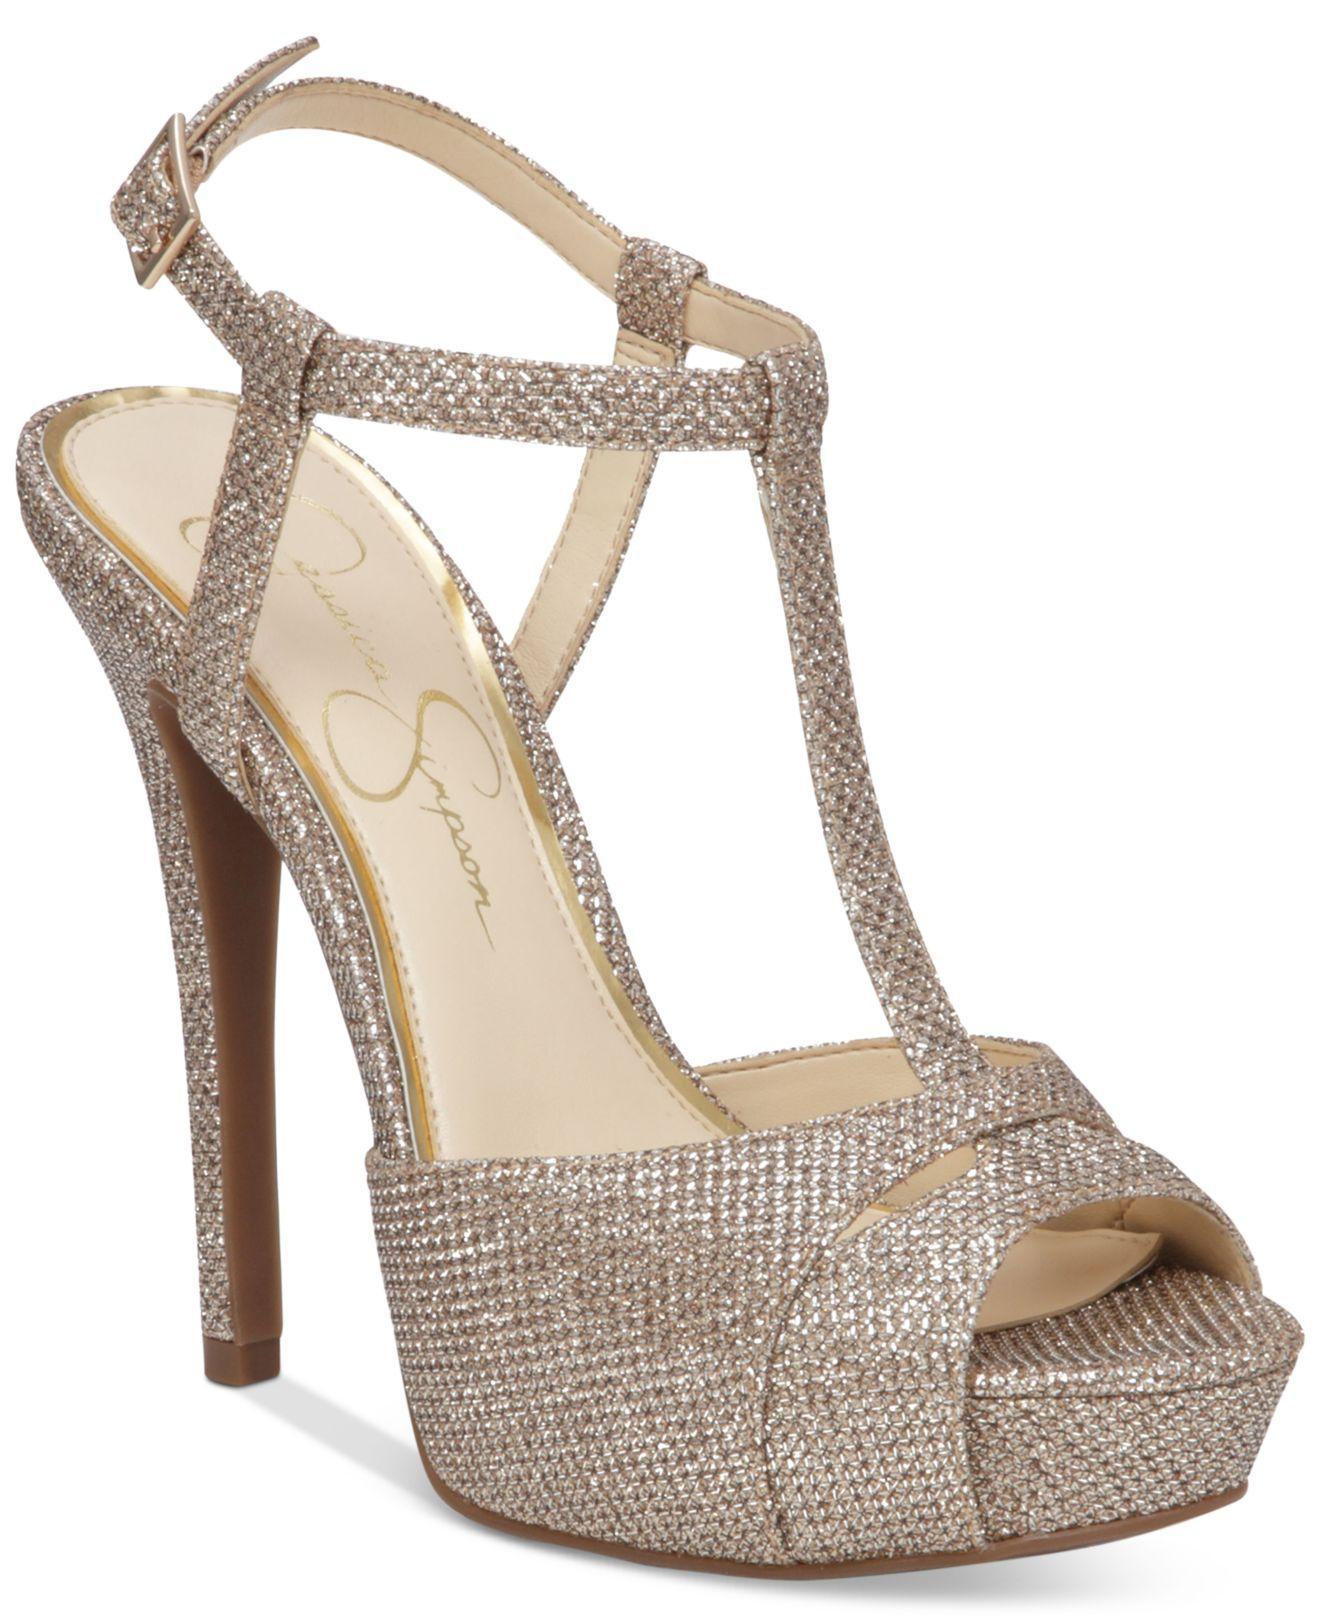 Jessica Simpson Barretta Platform Sandals In Metallic Lyst